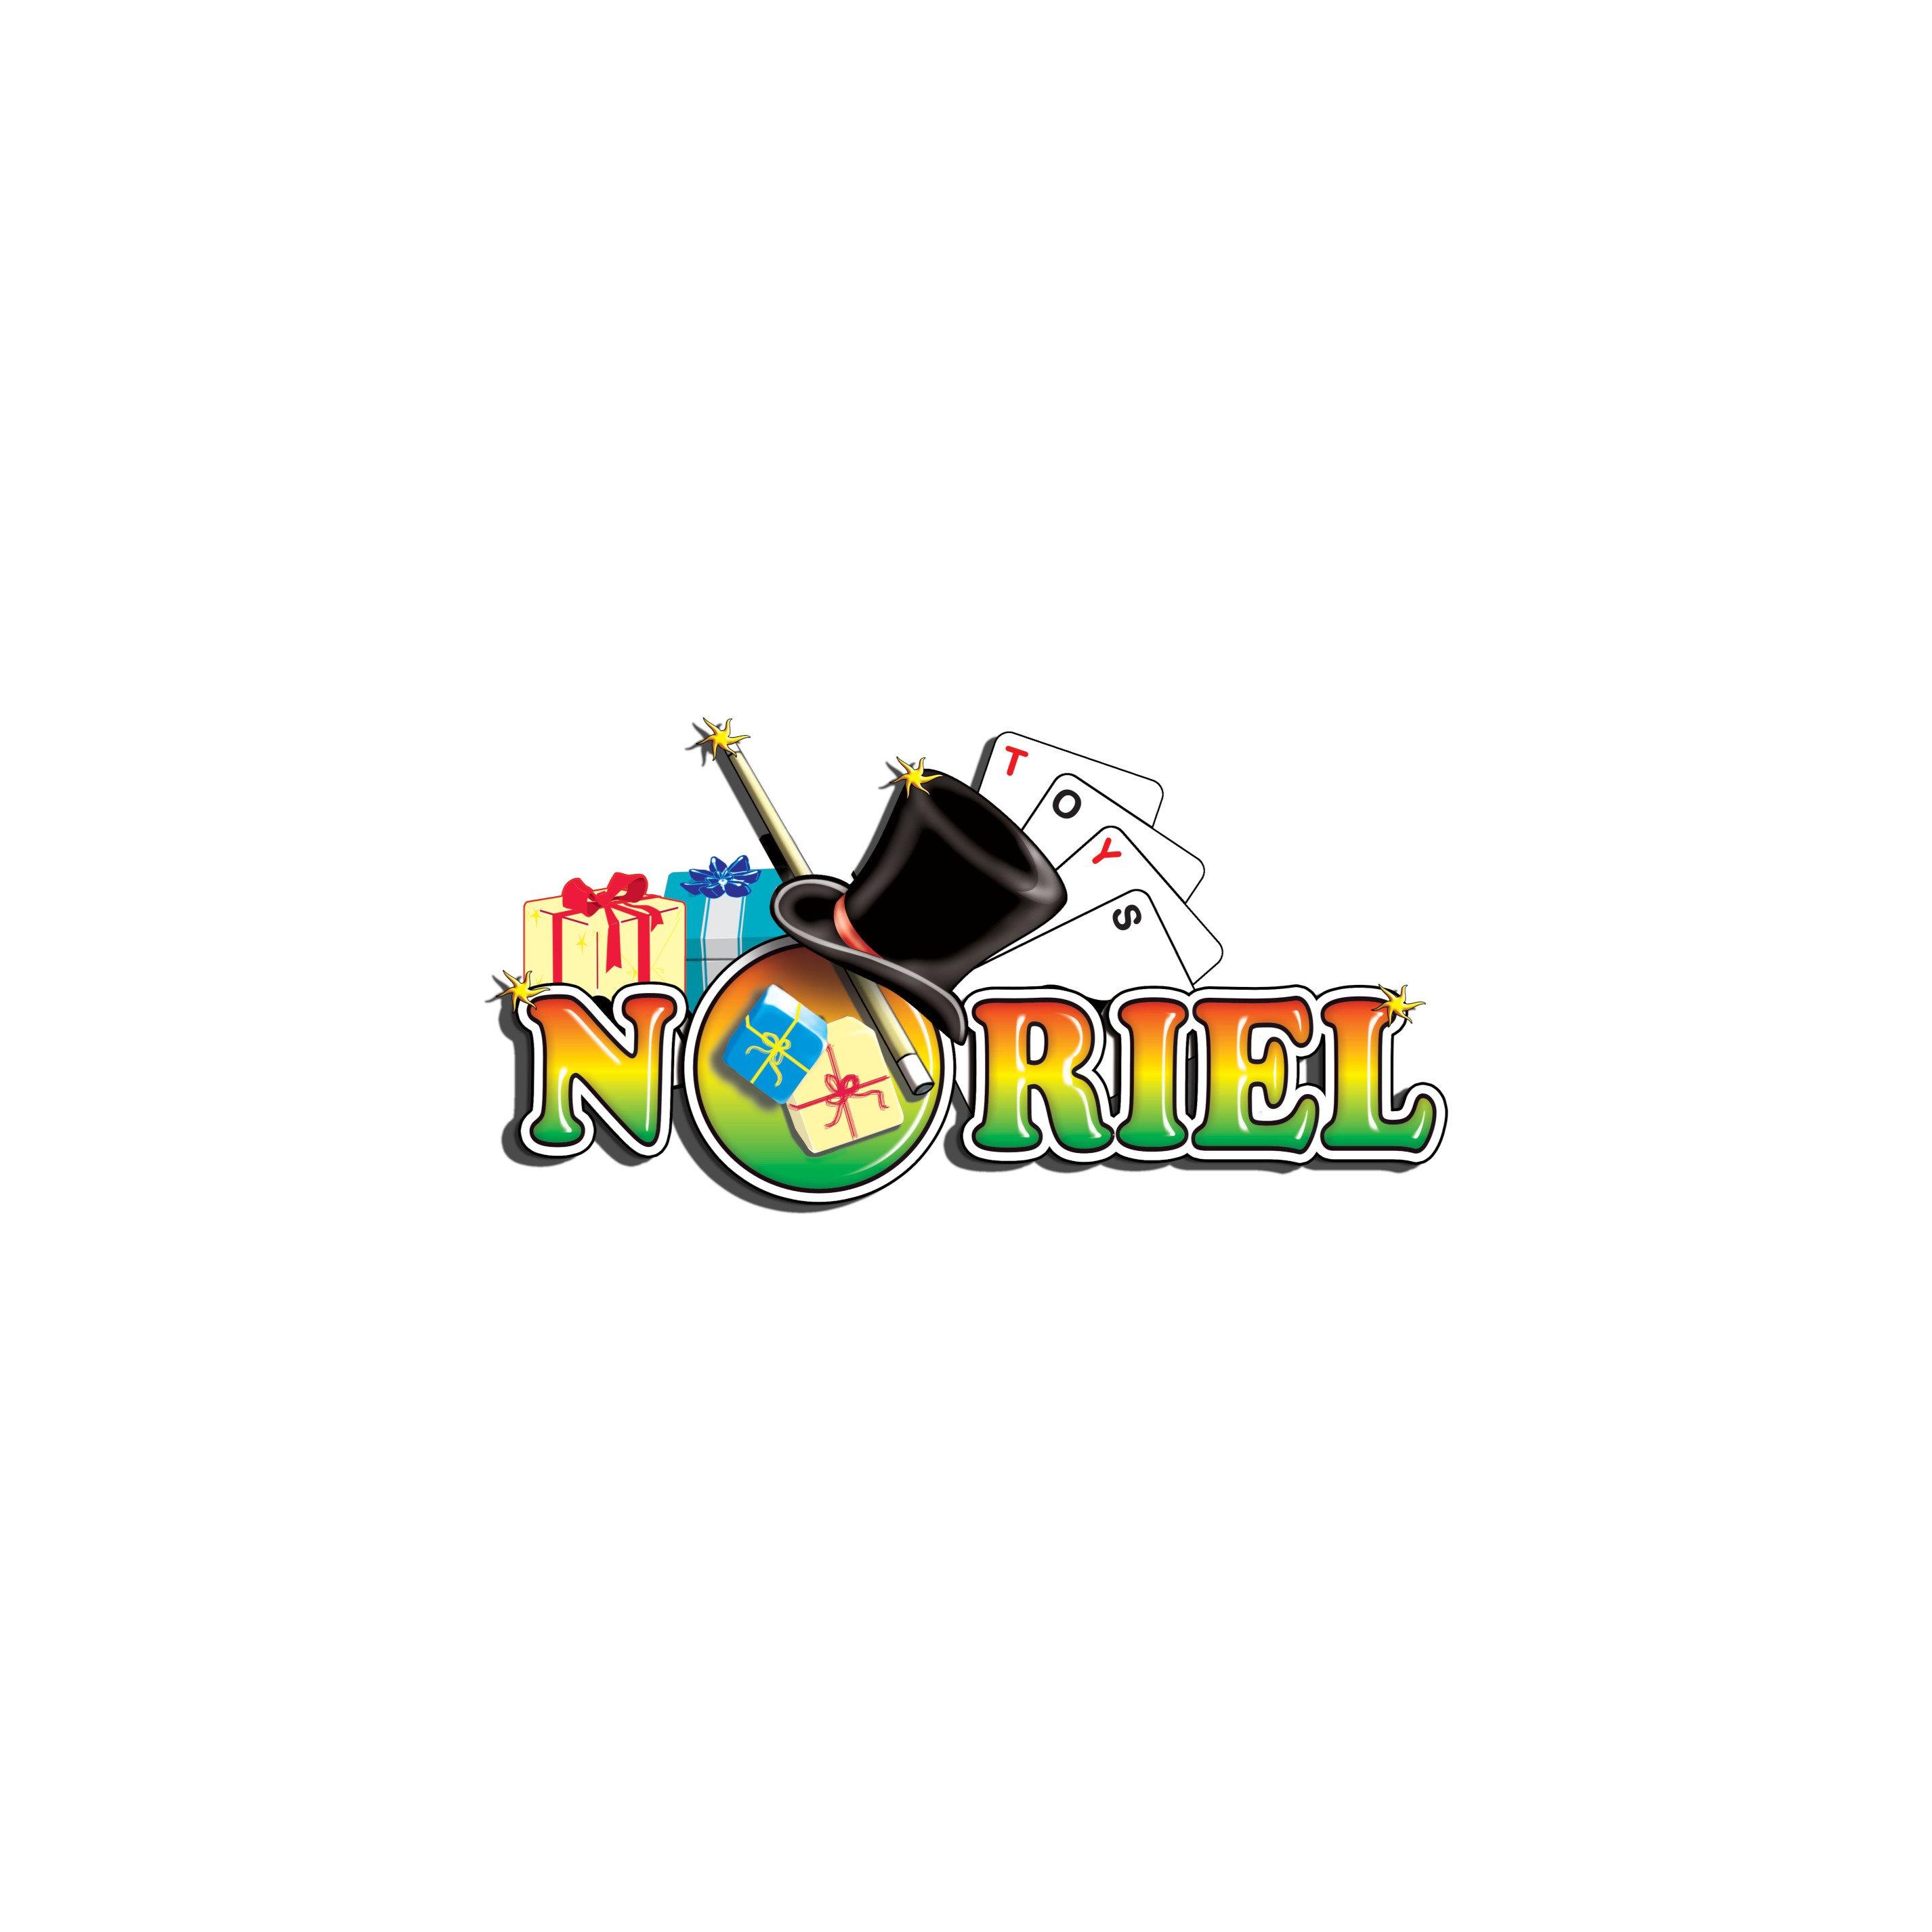 Veioza Philips, Winnie the Pooh, 717643416